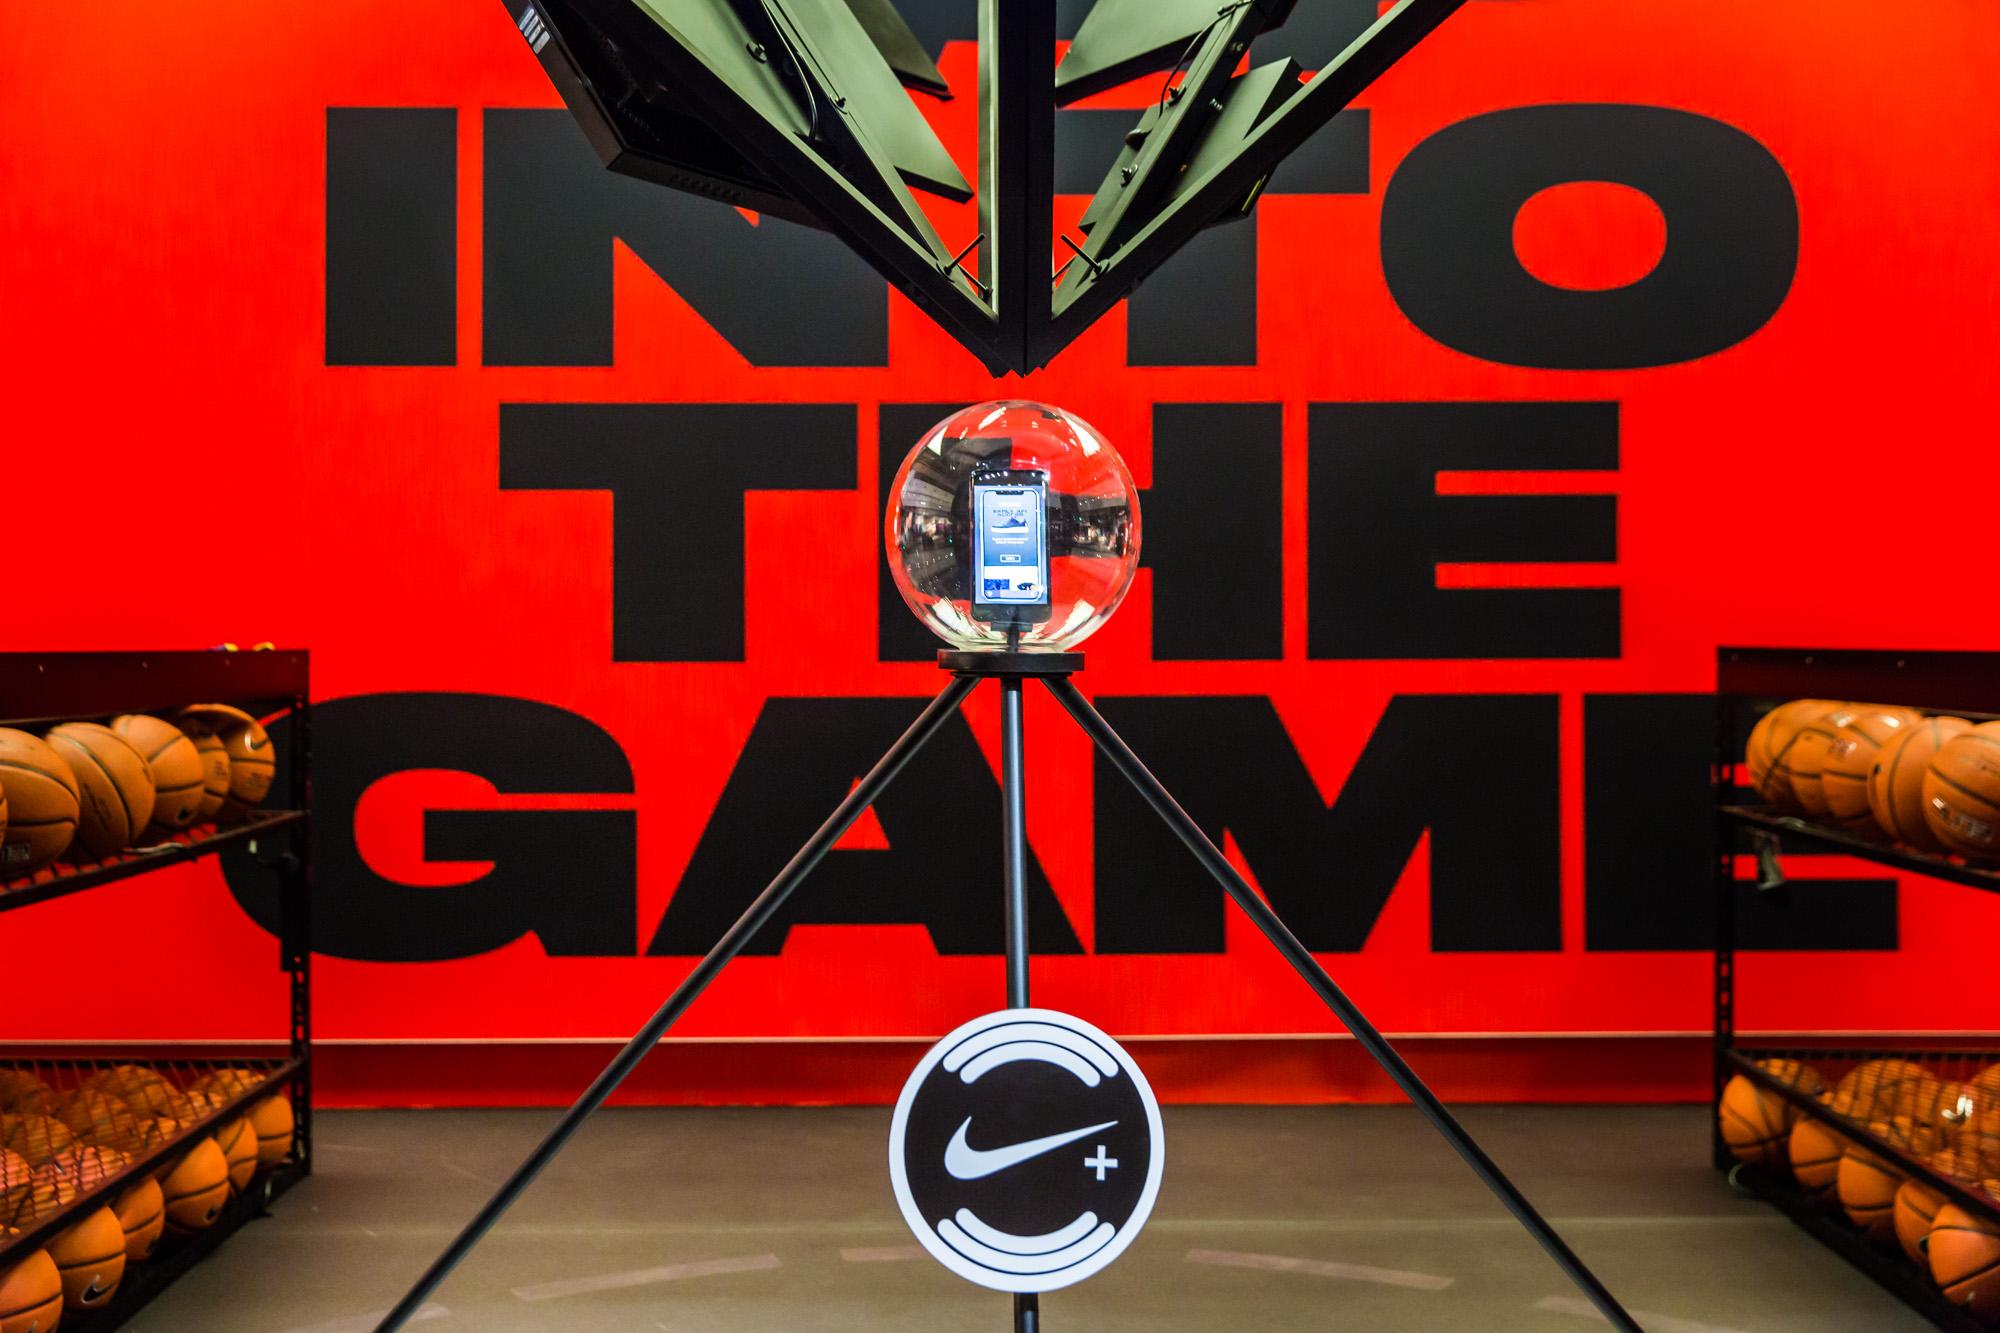 TDM_3232 - Nike - NBA Launch - NTL - Tom D Morgan - WEB.jpg